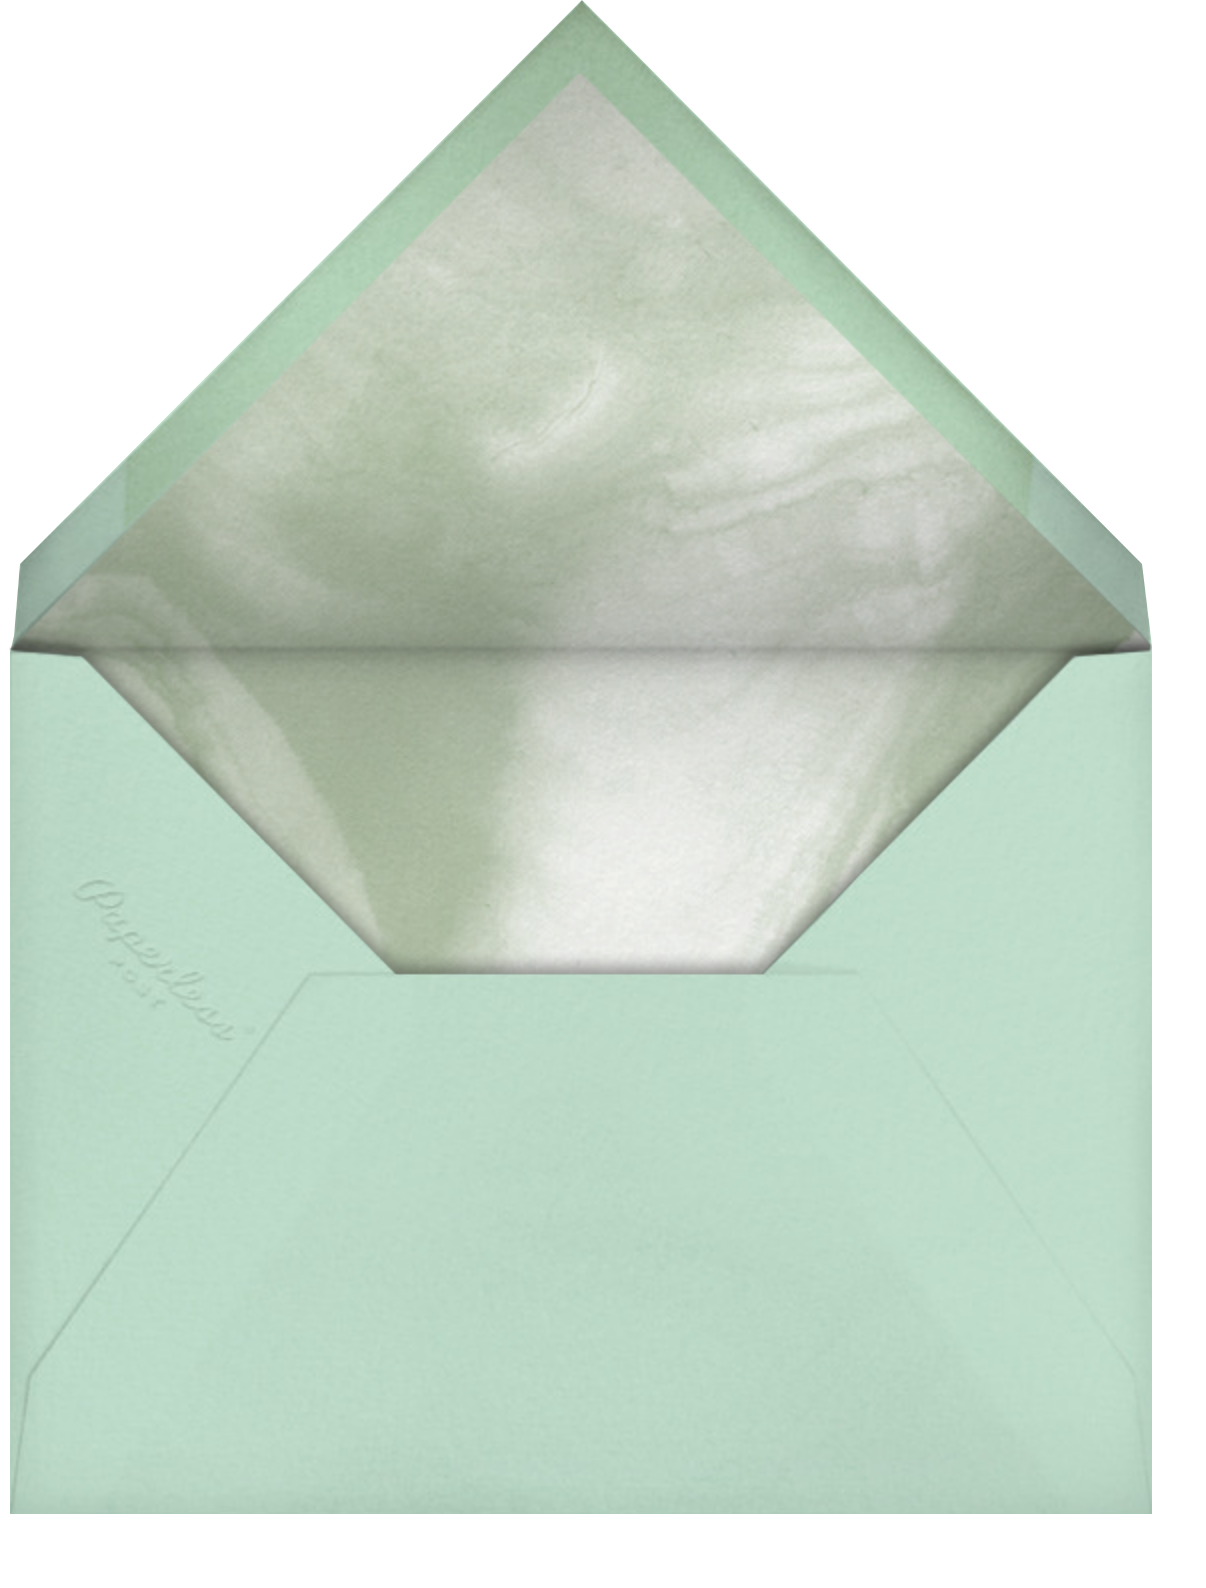 Fresh Leaves - Mint - Paperless Post - Photo  - envelope back